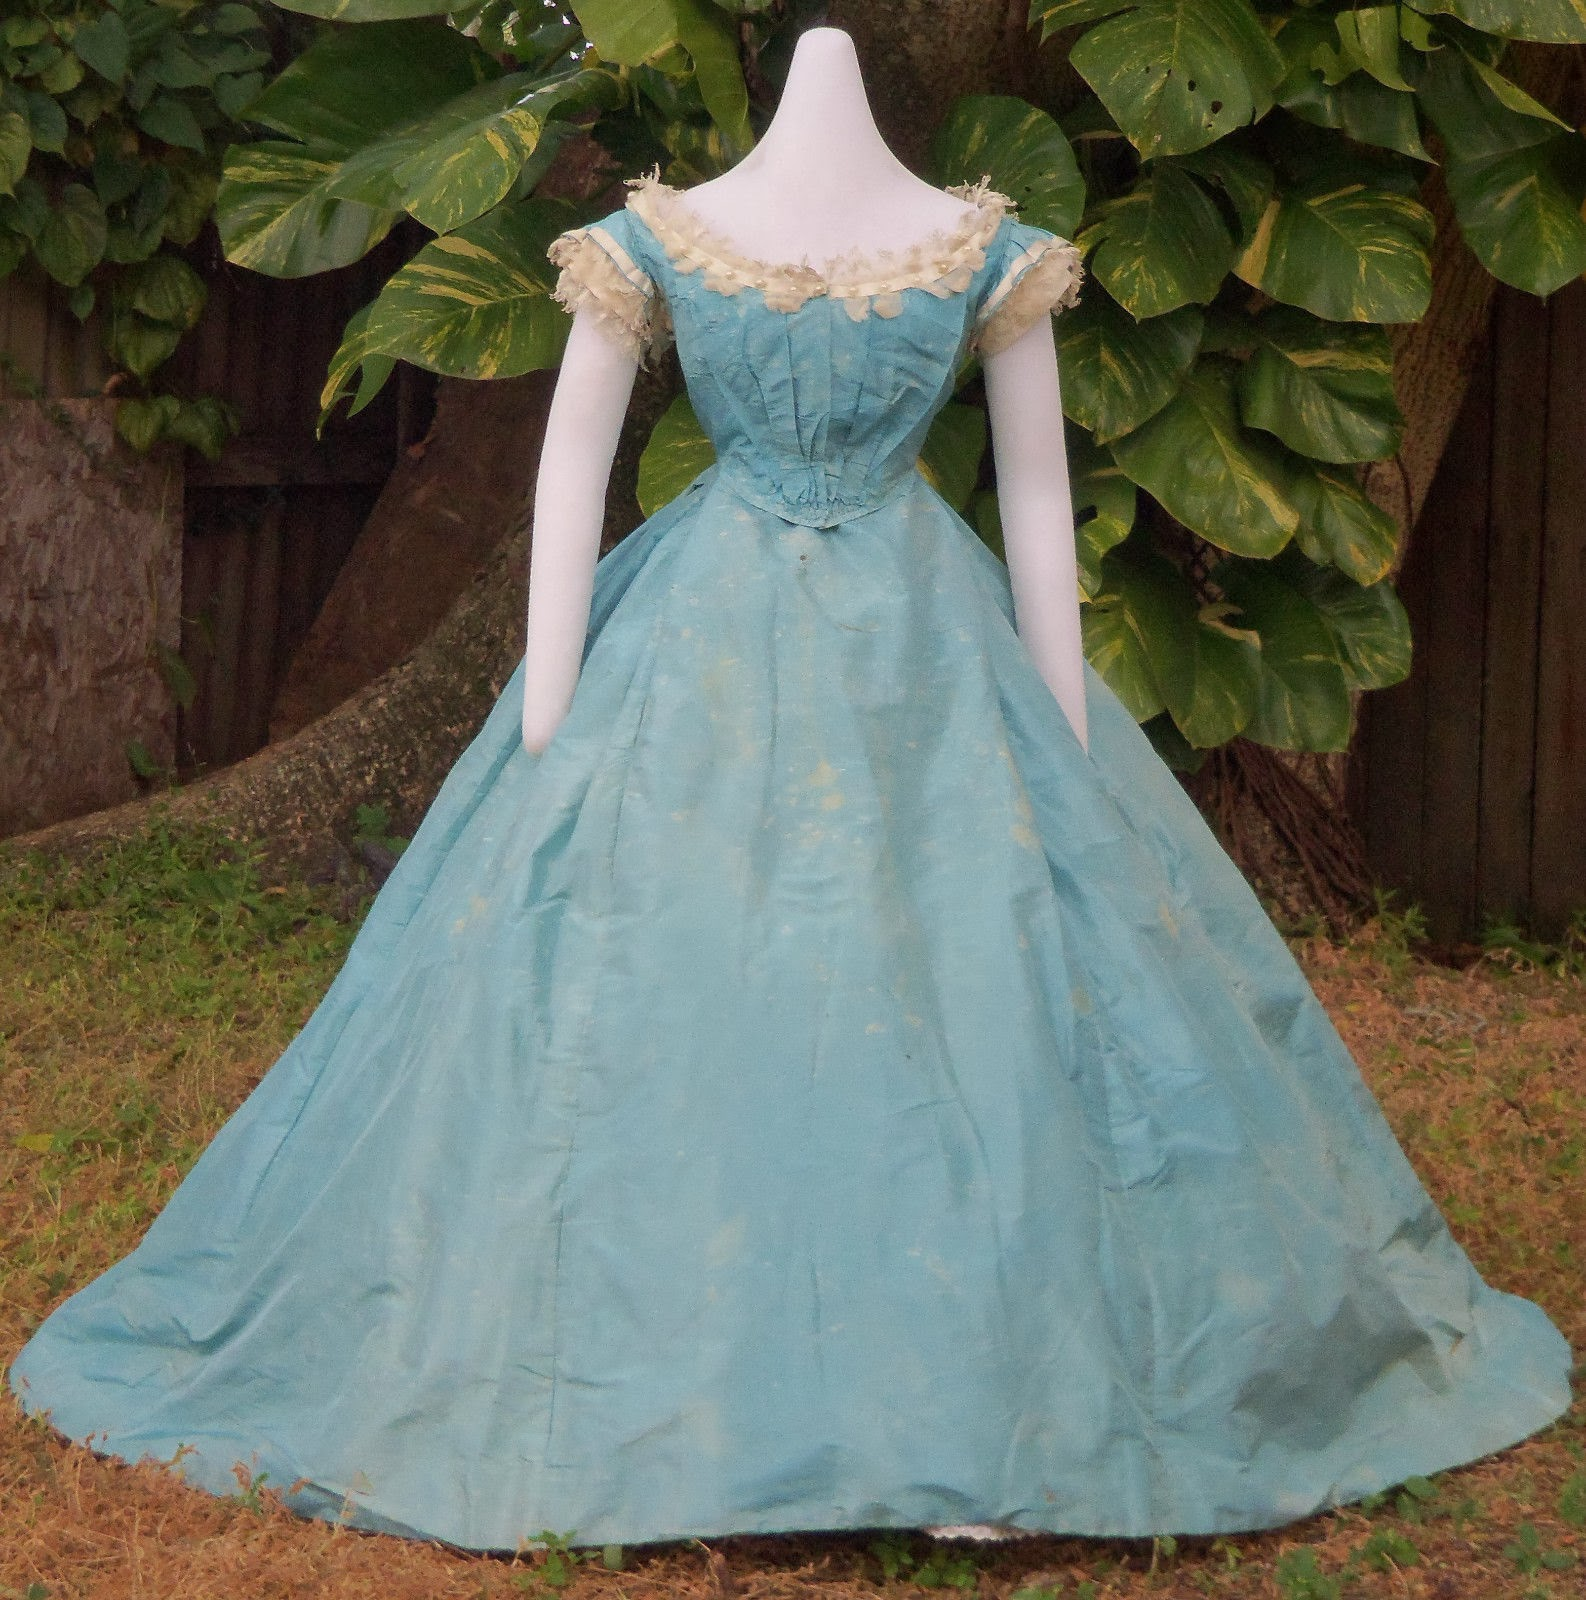 All The Pretty Dresses: American Civil War Era Ball Gown